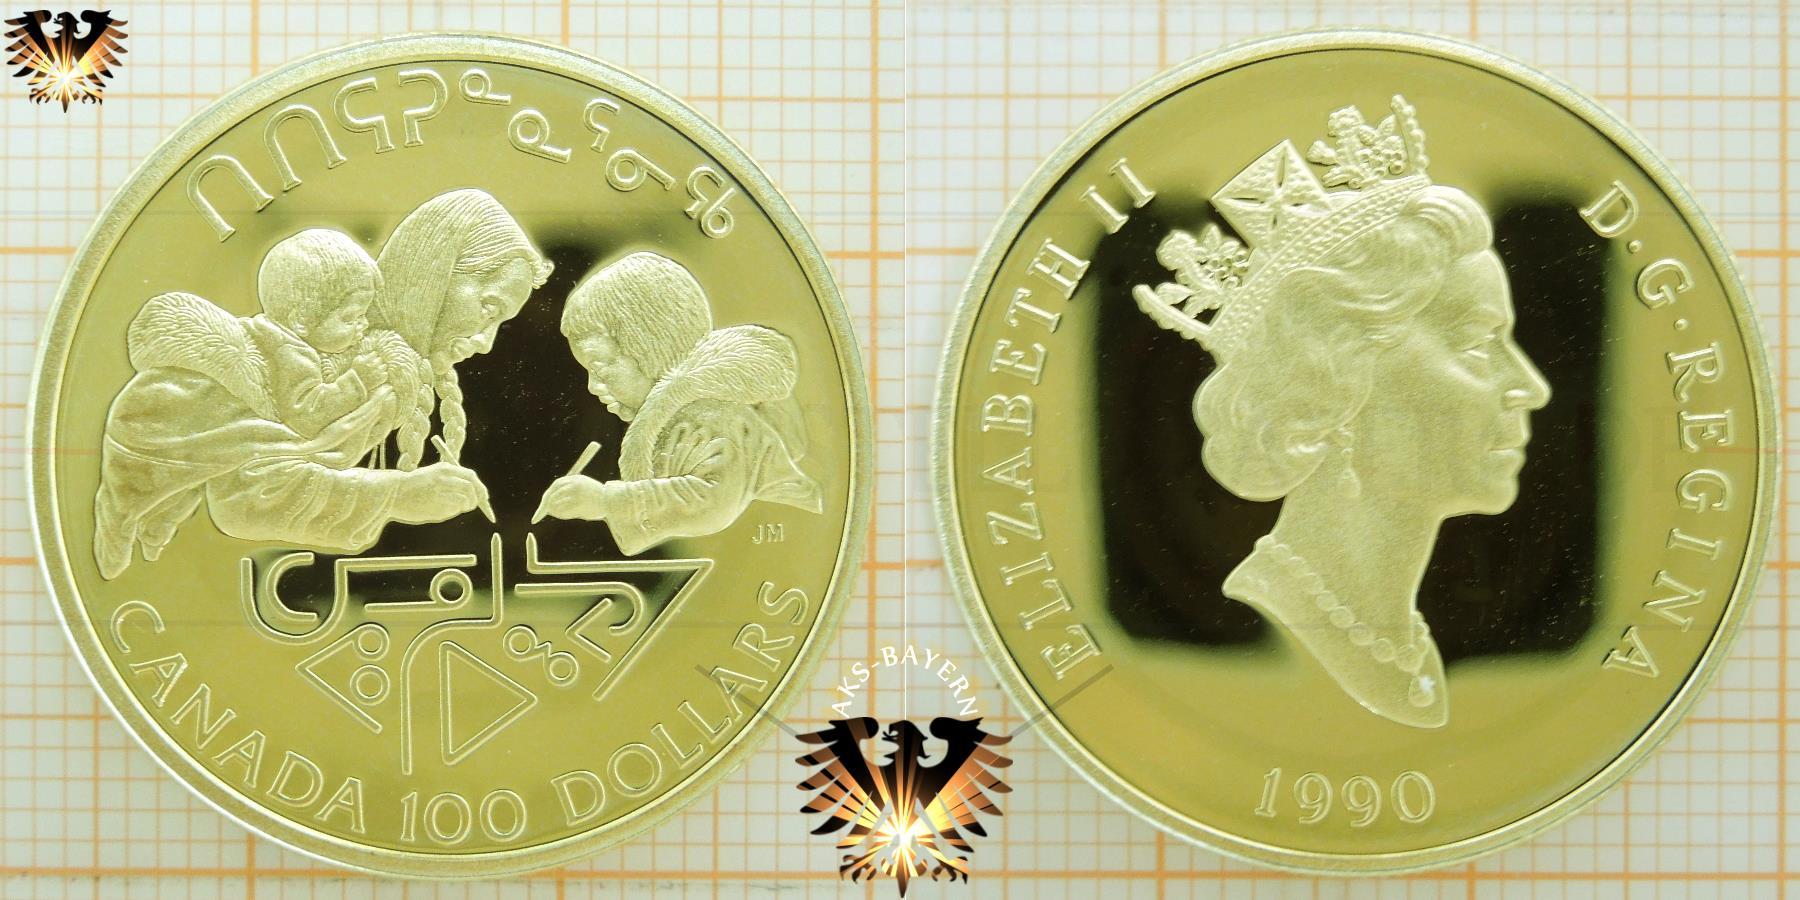 Canada 100 Dollars 1990 Goldmünze Daten Info Wert Preis